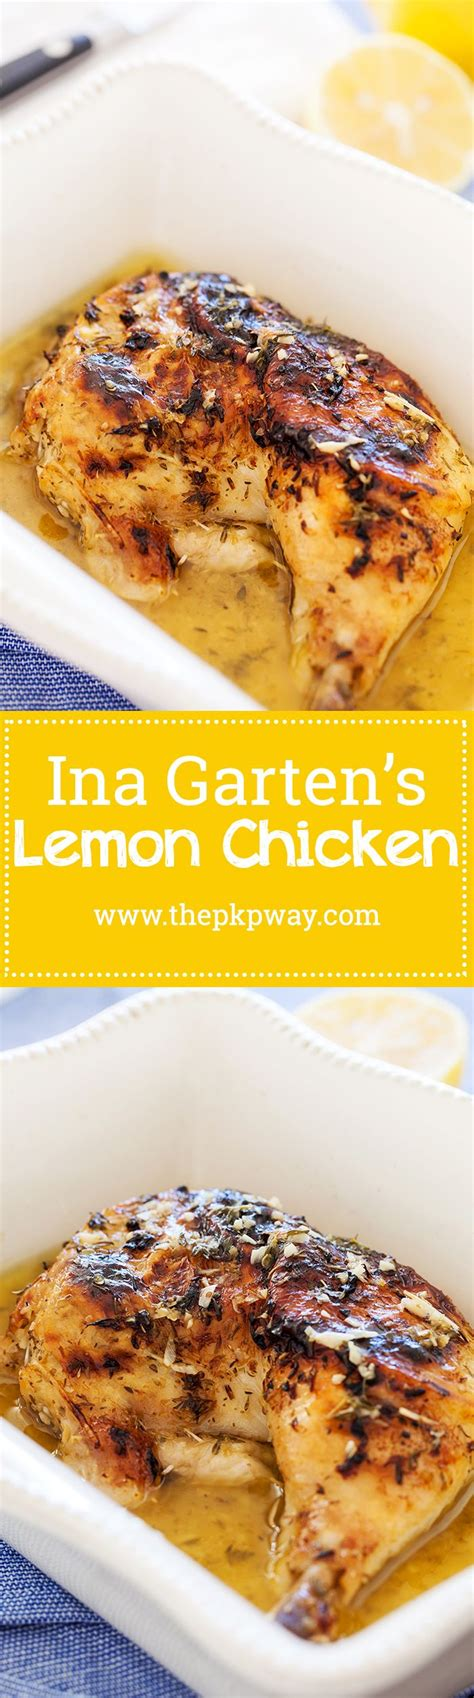 ina garten make ahead recipes ina garten s lemon chicken recipe ina garten on the